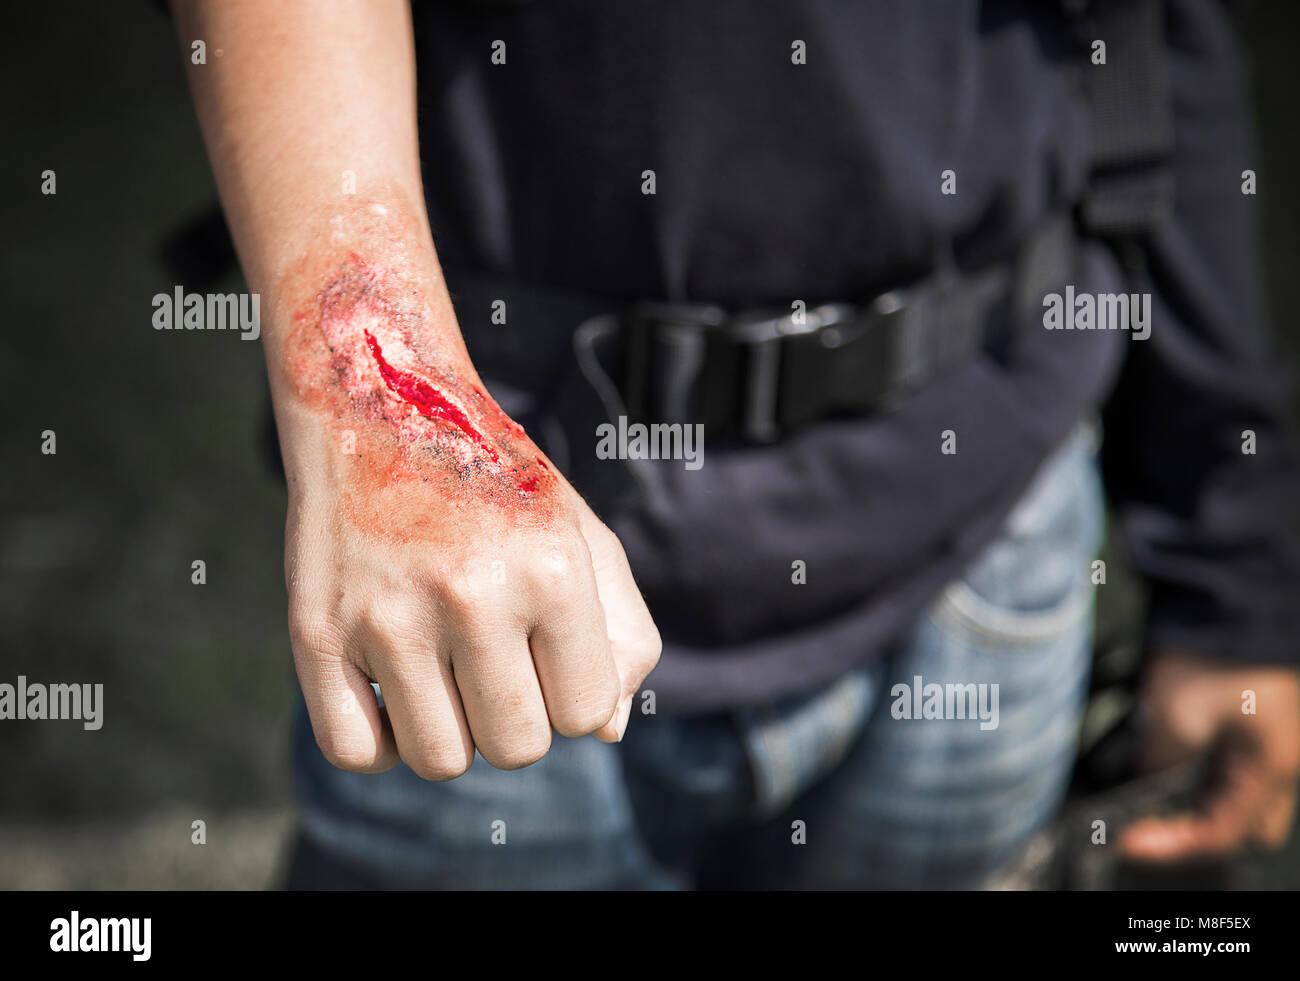 acidence scar make up artist on stuntman hand in cinema industry - Stock Image